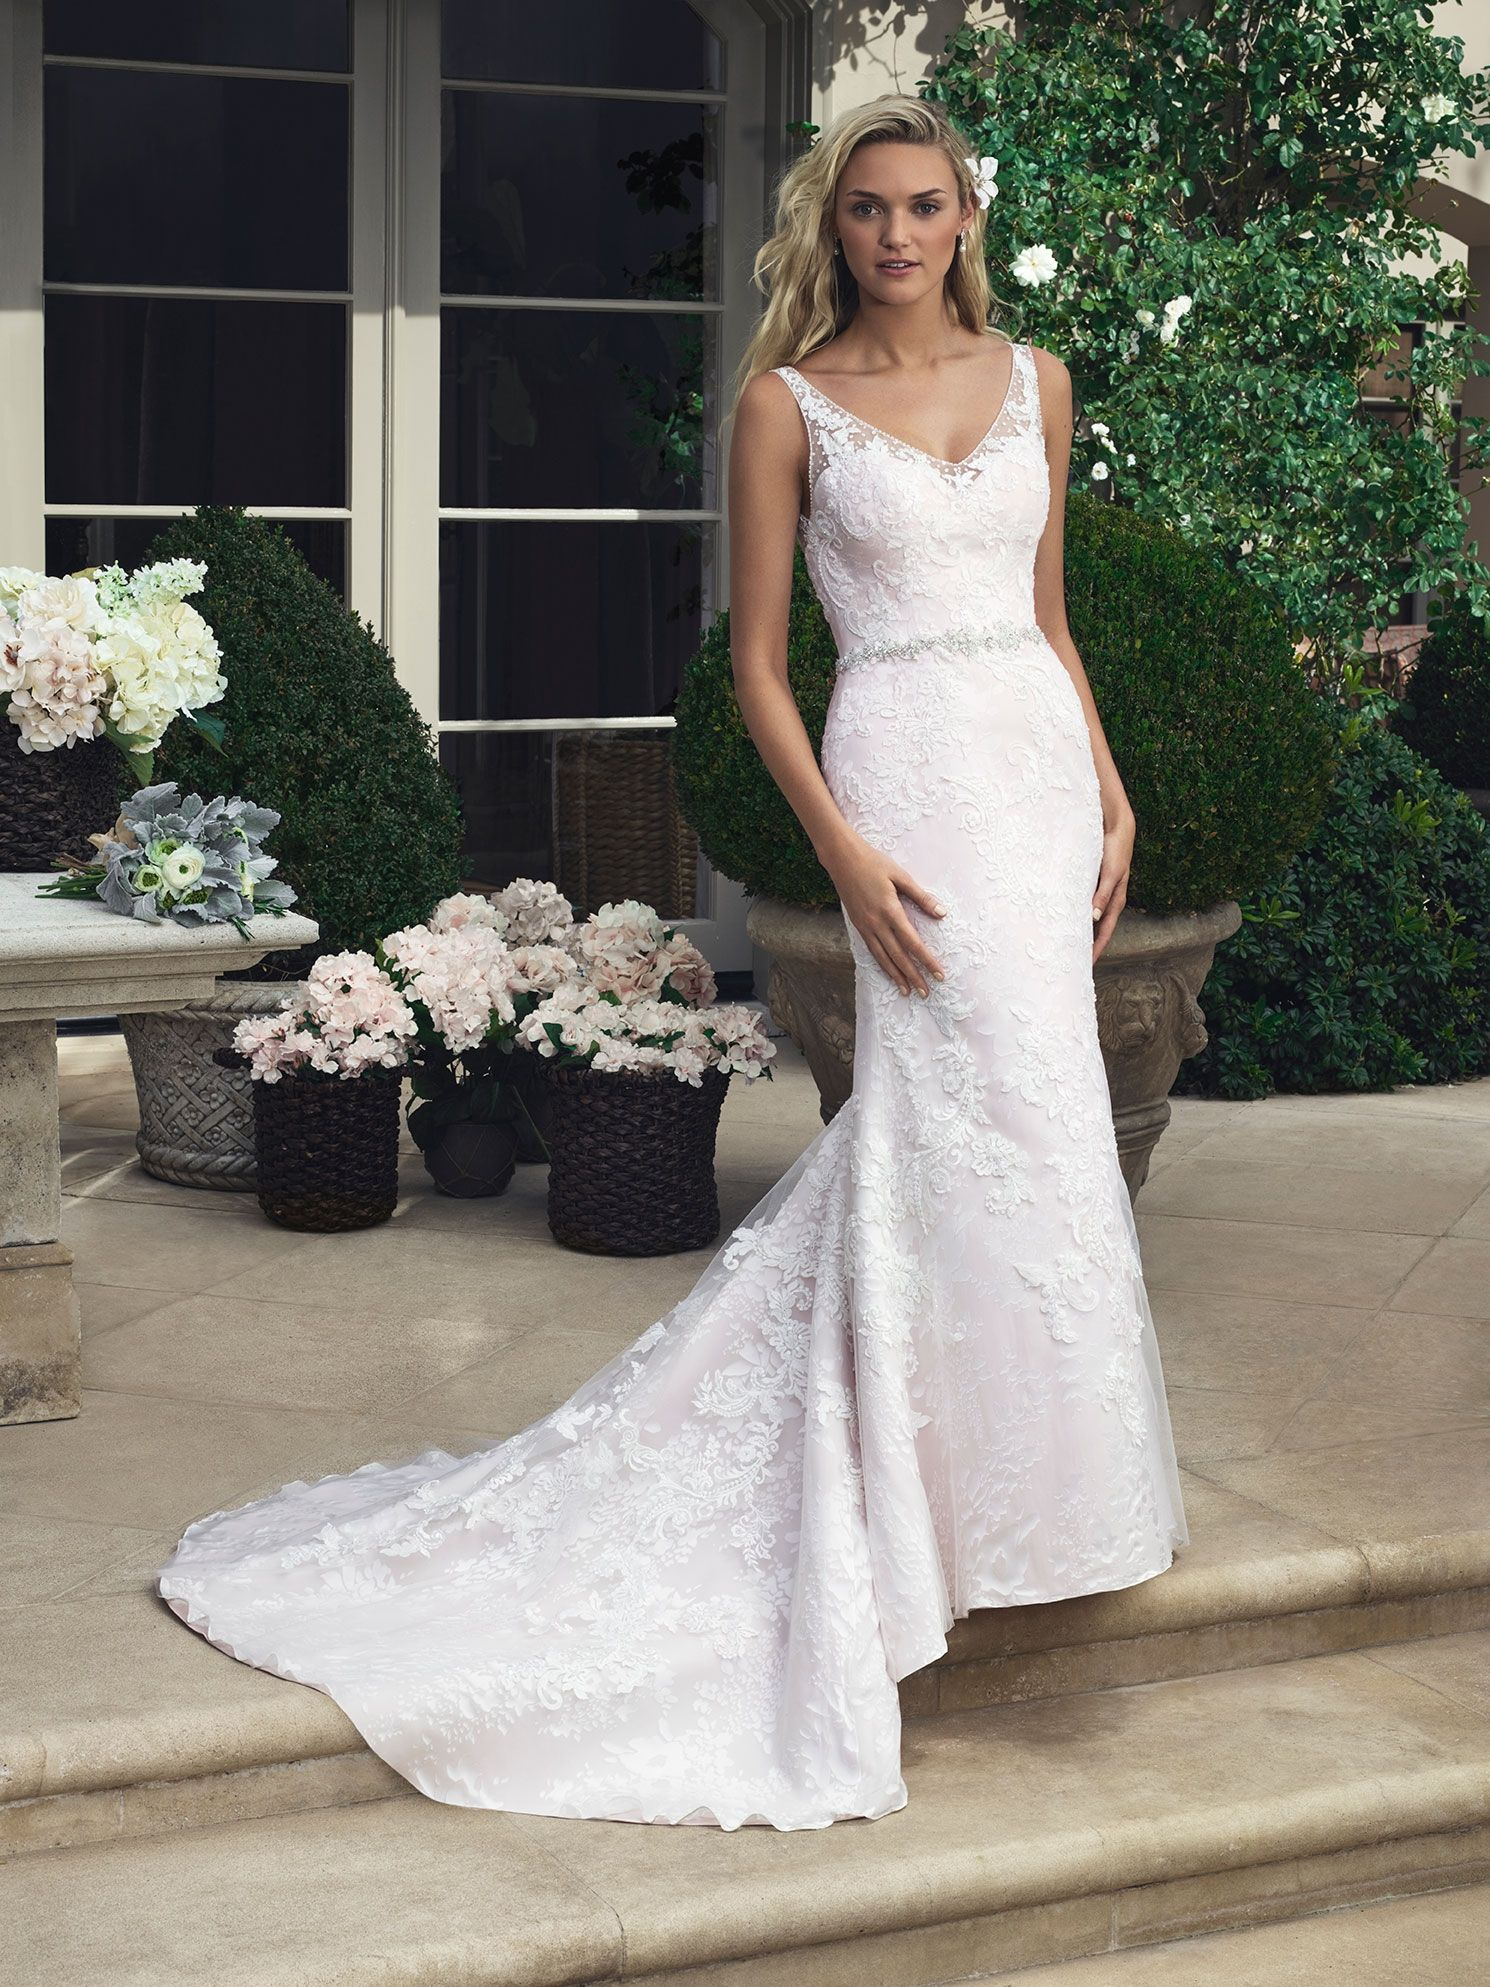 Casablanca Bridal 2204 Ivory/Ivory/Silver Size 12 299